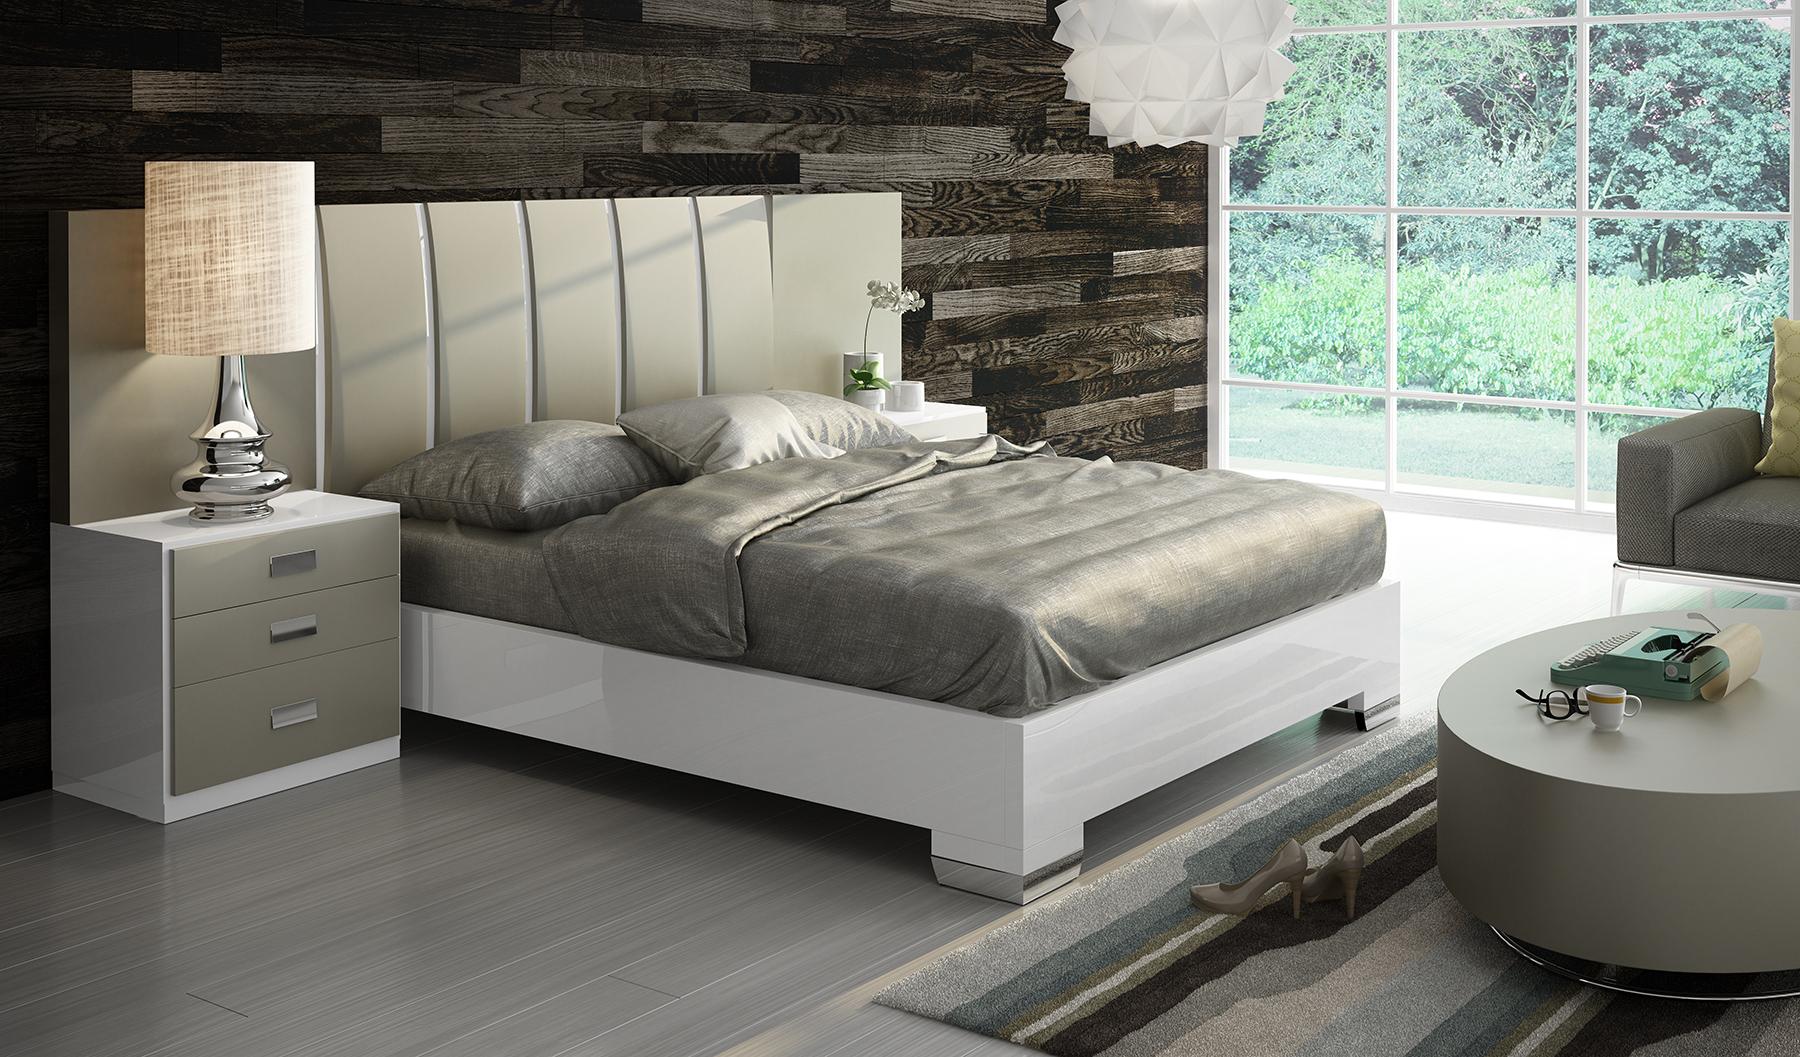 Fenicia Composition 12 / comp 607, Fenicia Modern Bedroom Sets ...